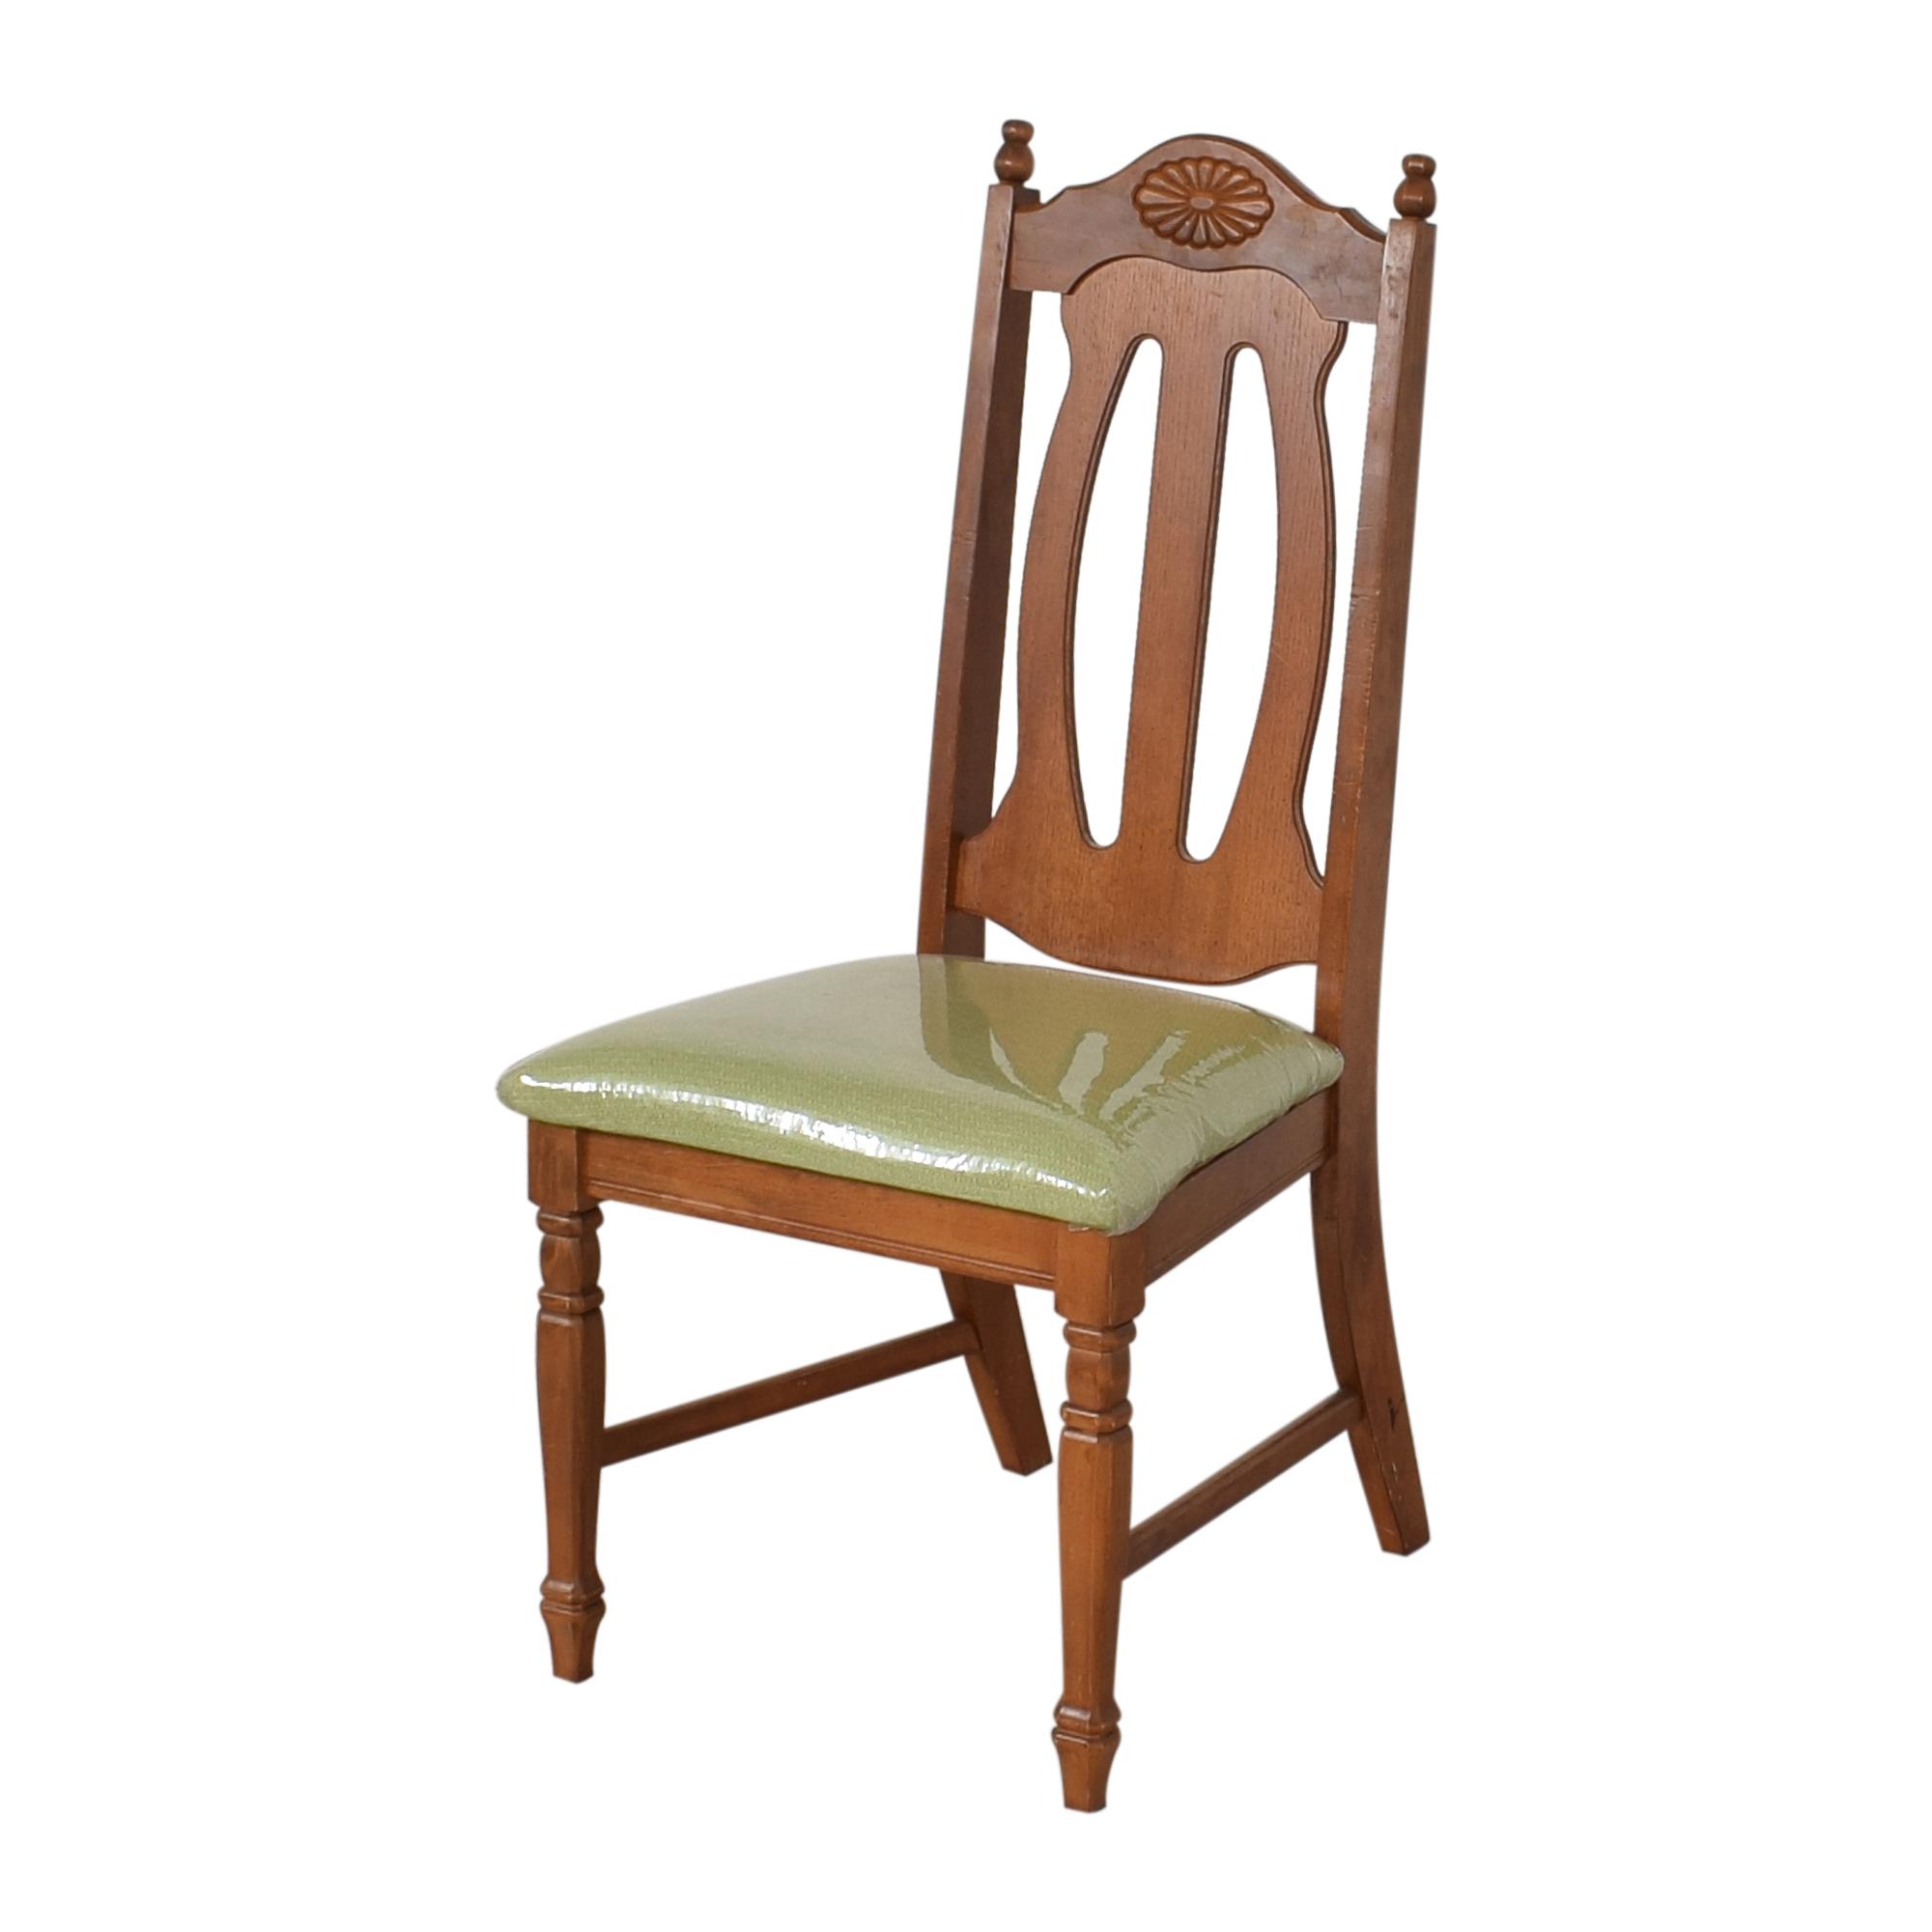 Bassett Furniture Bassett Furniture Vintage Dining Chairs discount